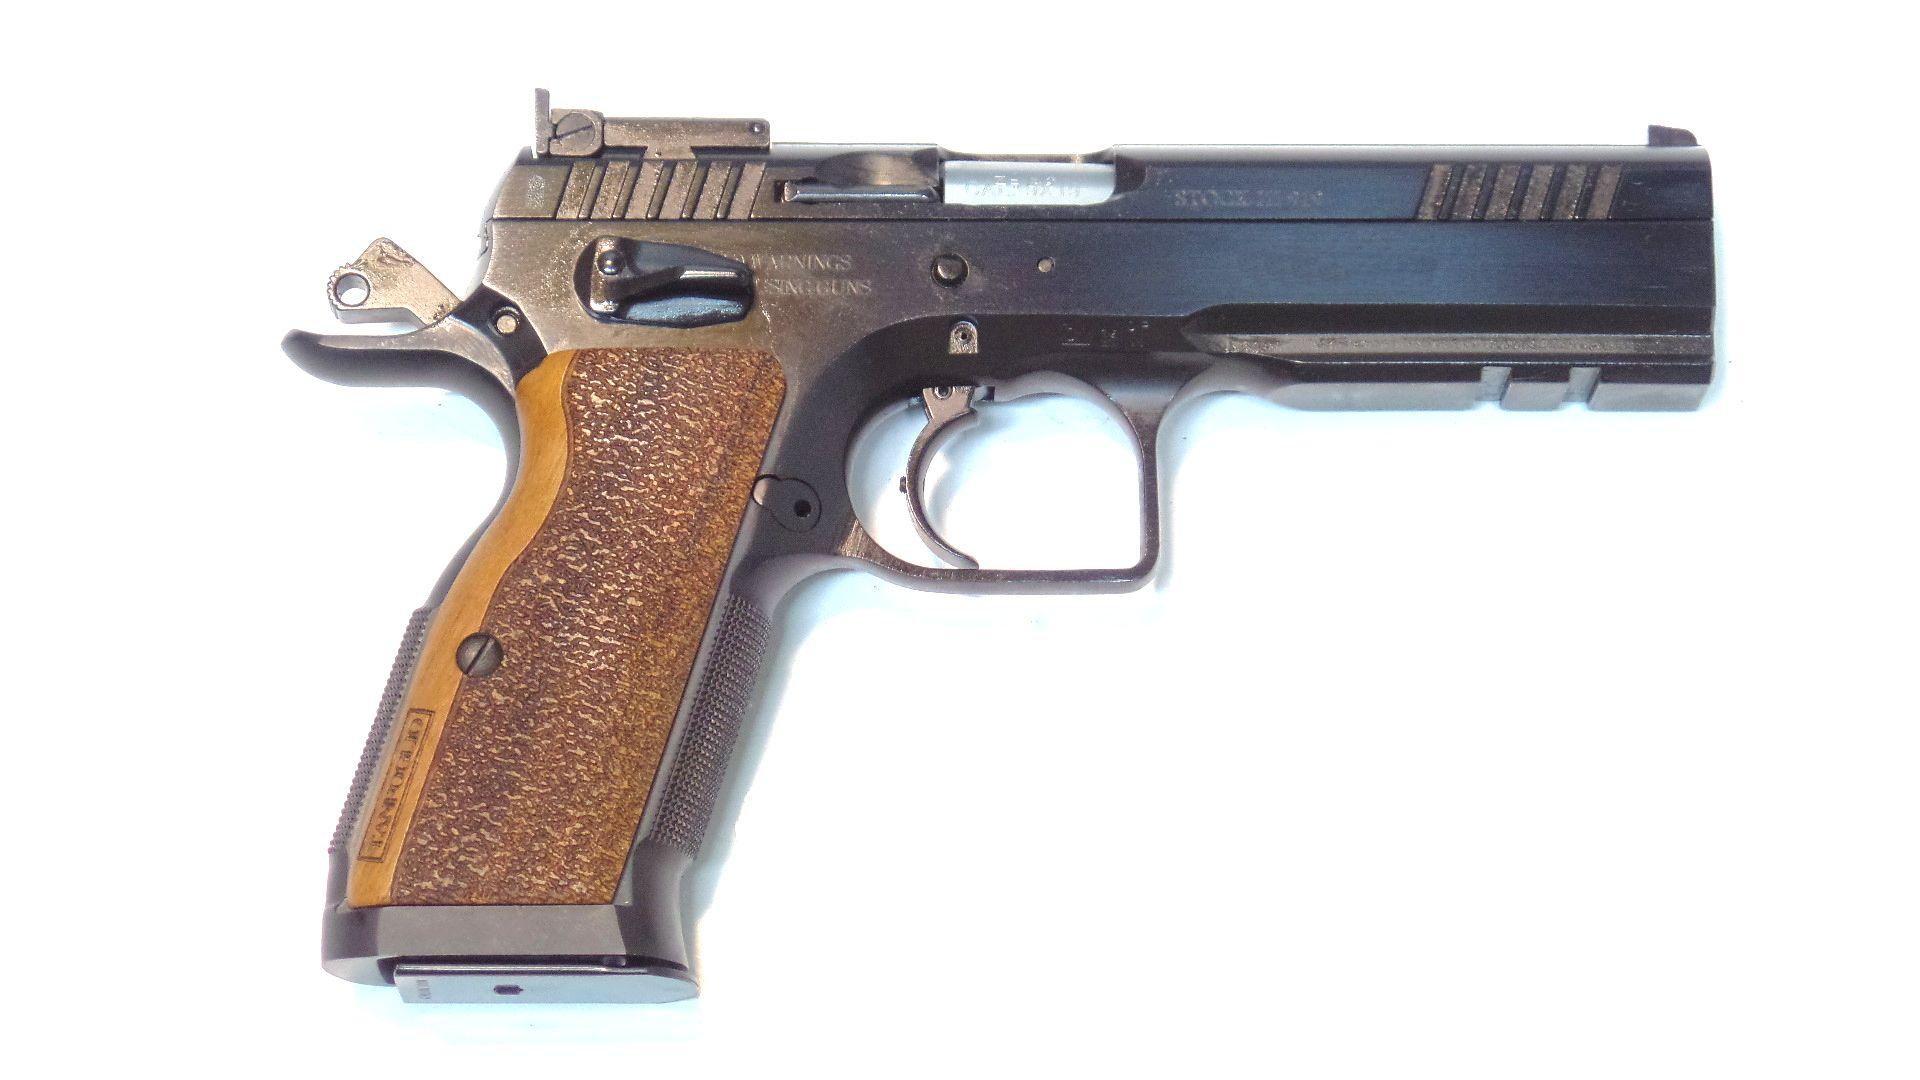 TANFOGLIO STOCK III calibre 9Para